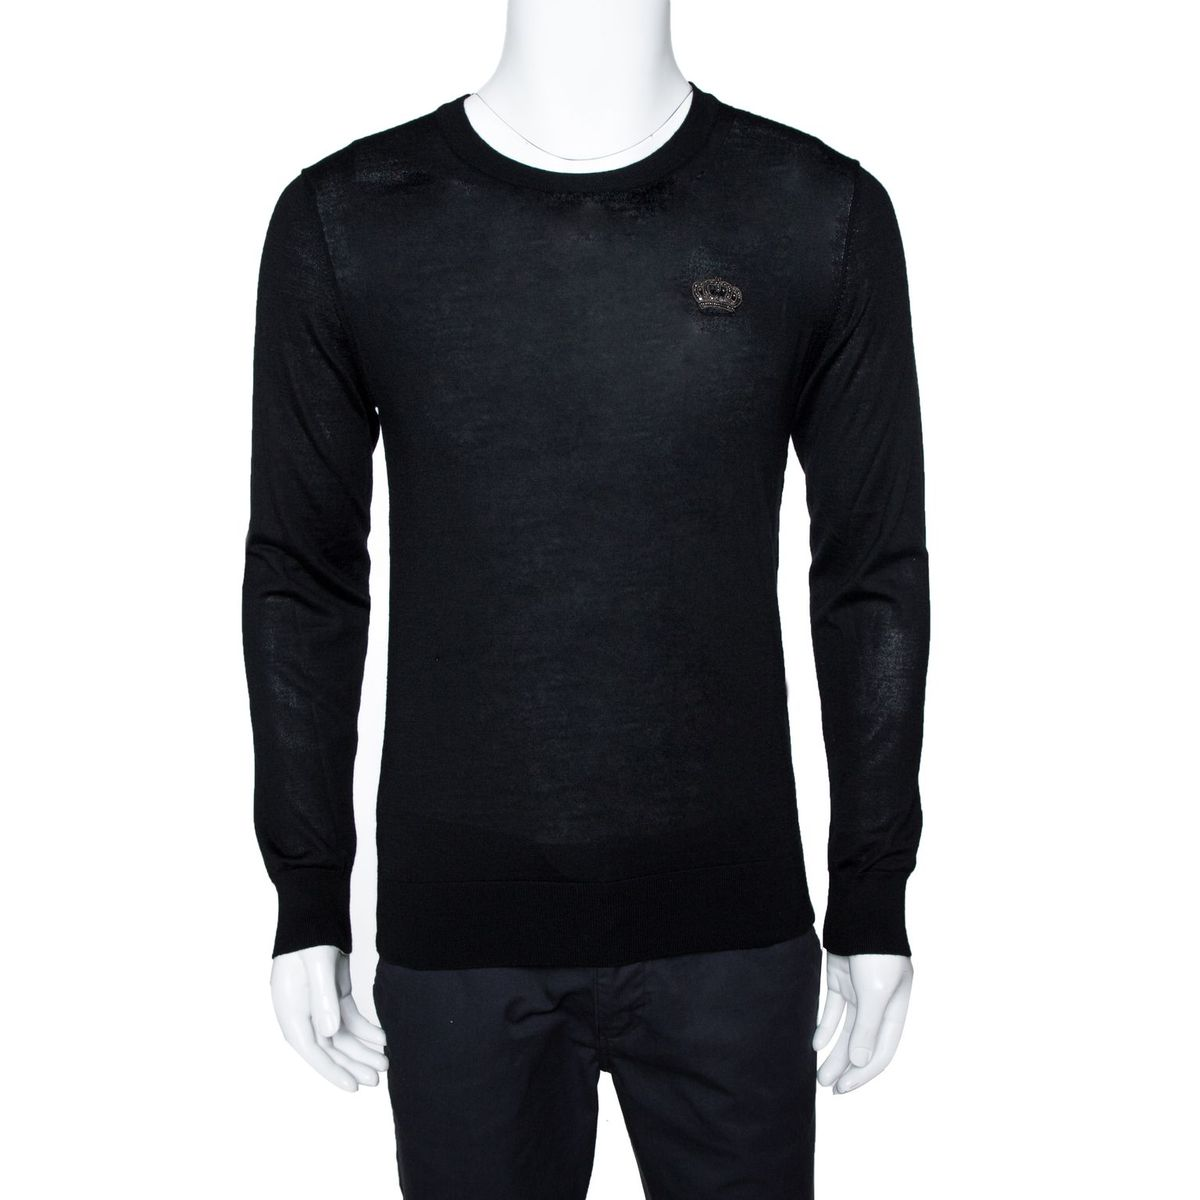 Dolce & Gabbana Black Cashmere Embellished Crown Patch Ribbed Crew Neck Jumper IT 46